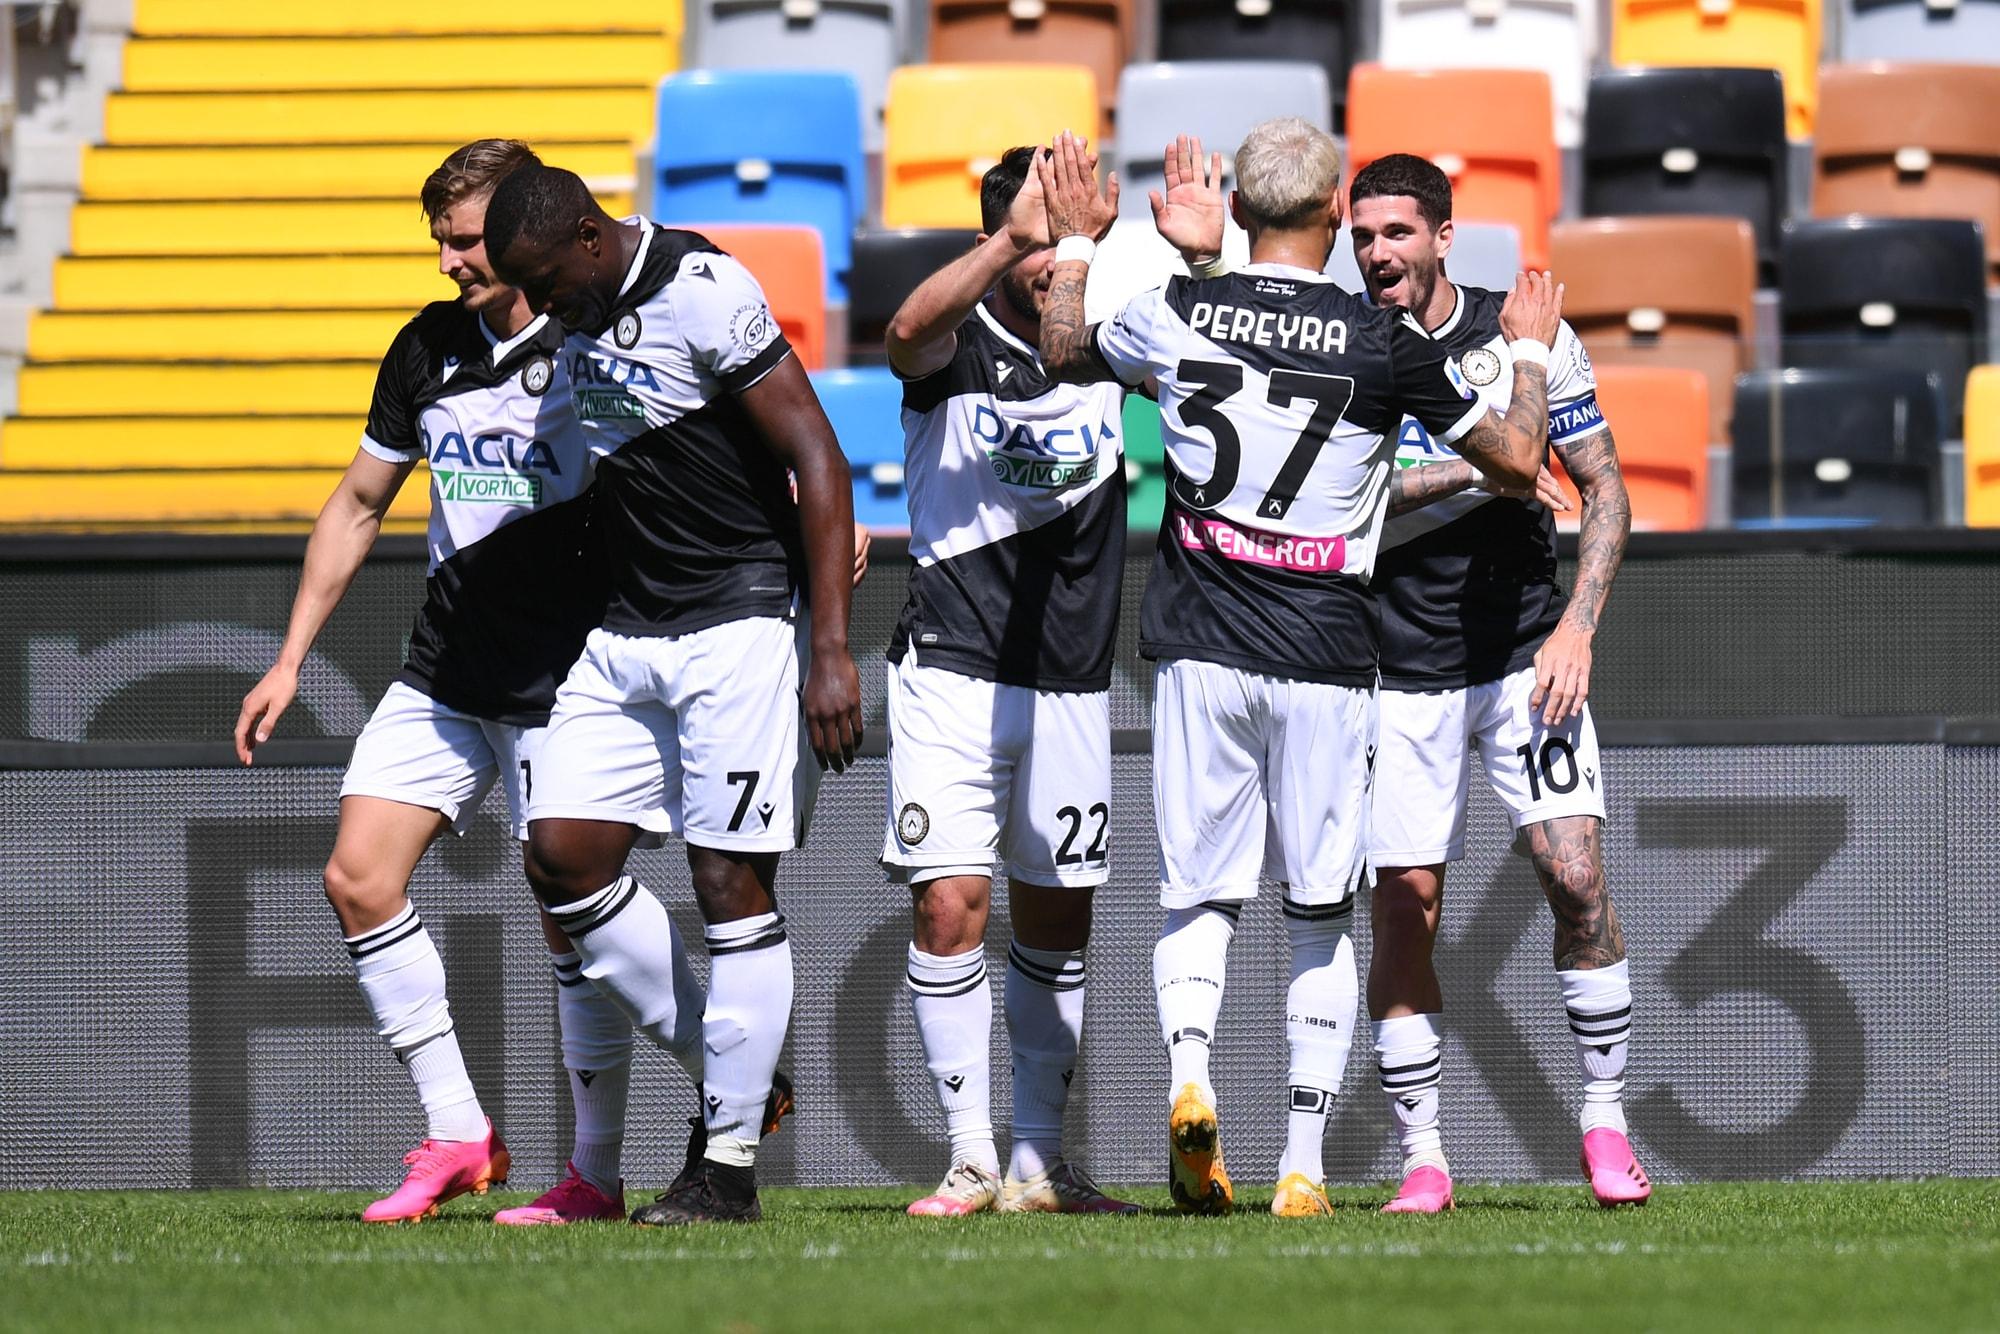 185810467 33c8c693 6920 4ec7 9c59 ec196787bb82 - L'Udinese supera 4-0 il Cjarlins Muzane: in gol Micin, Arslan e Okaka